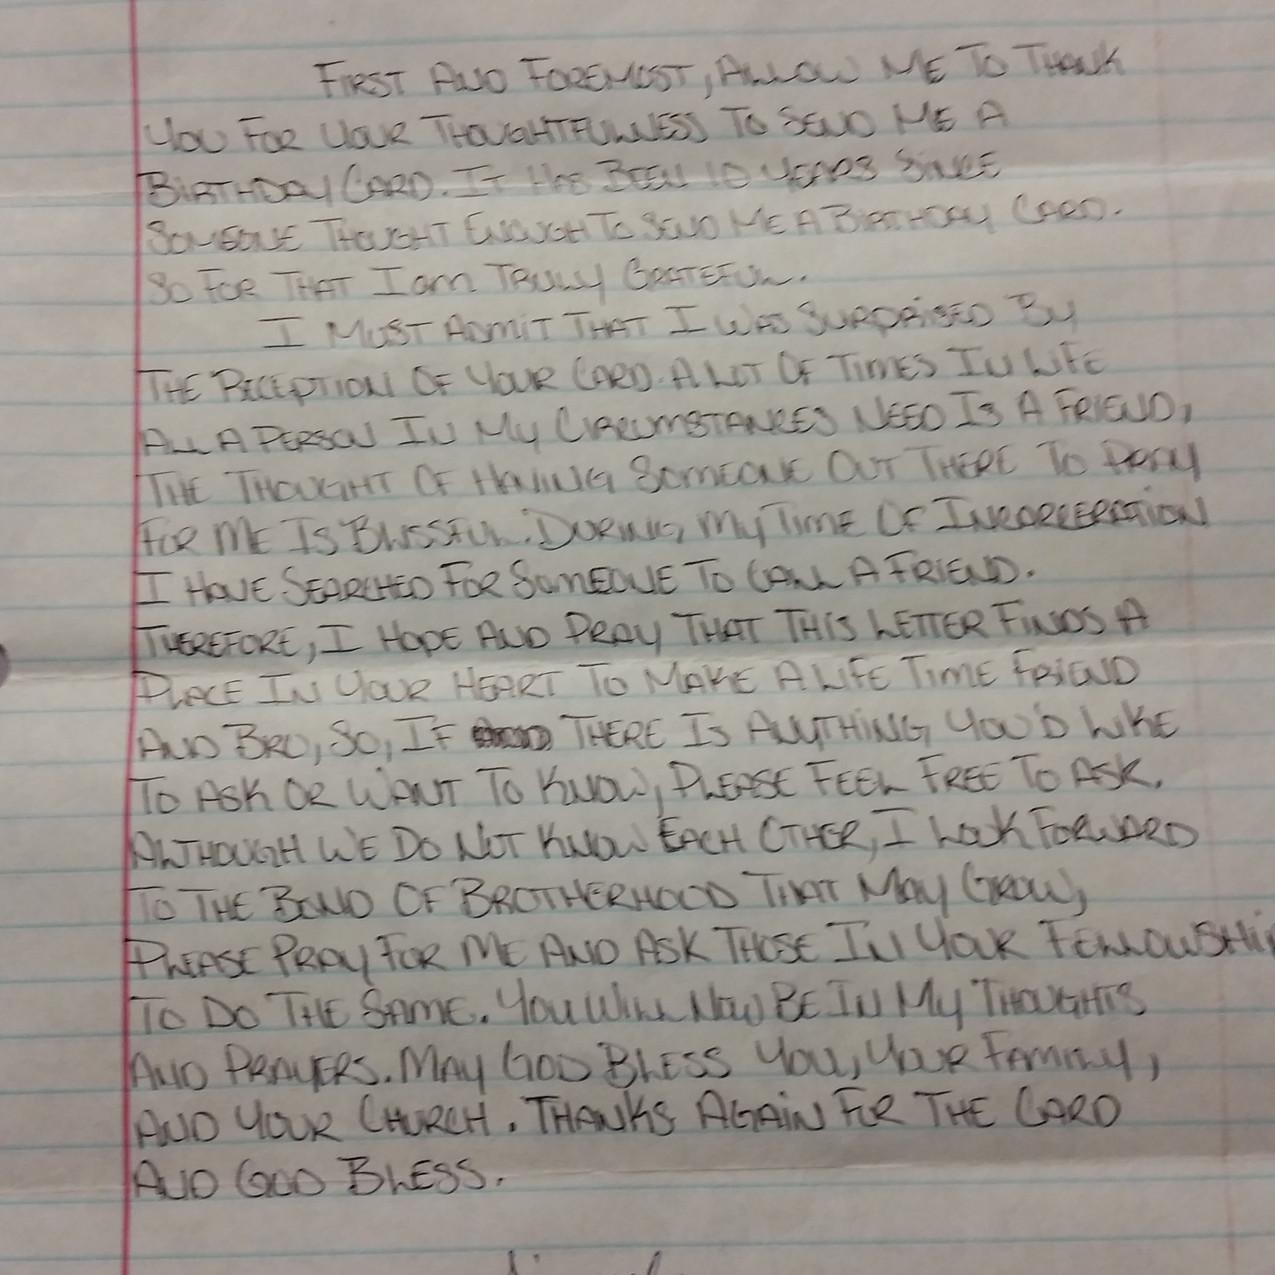 Letter from Deval